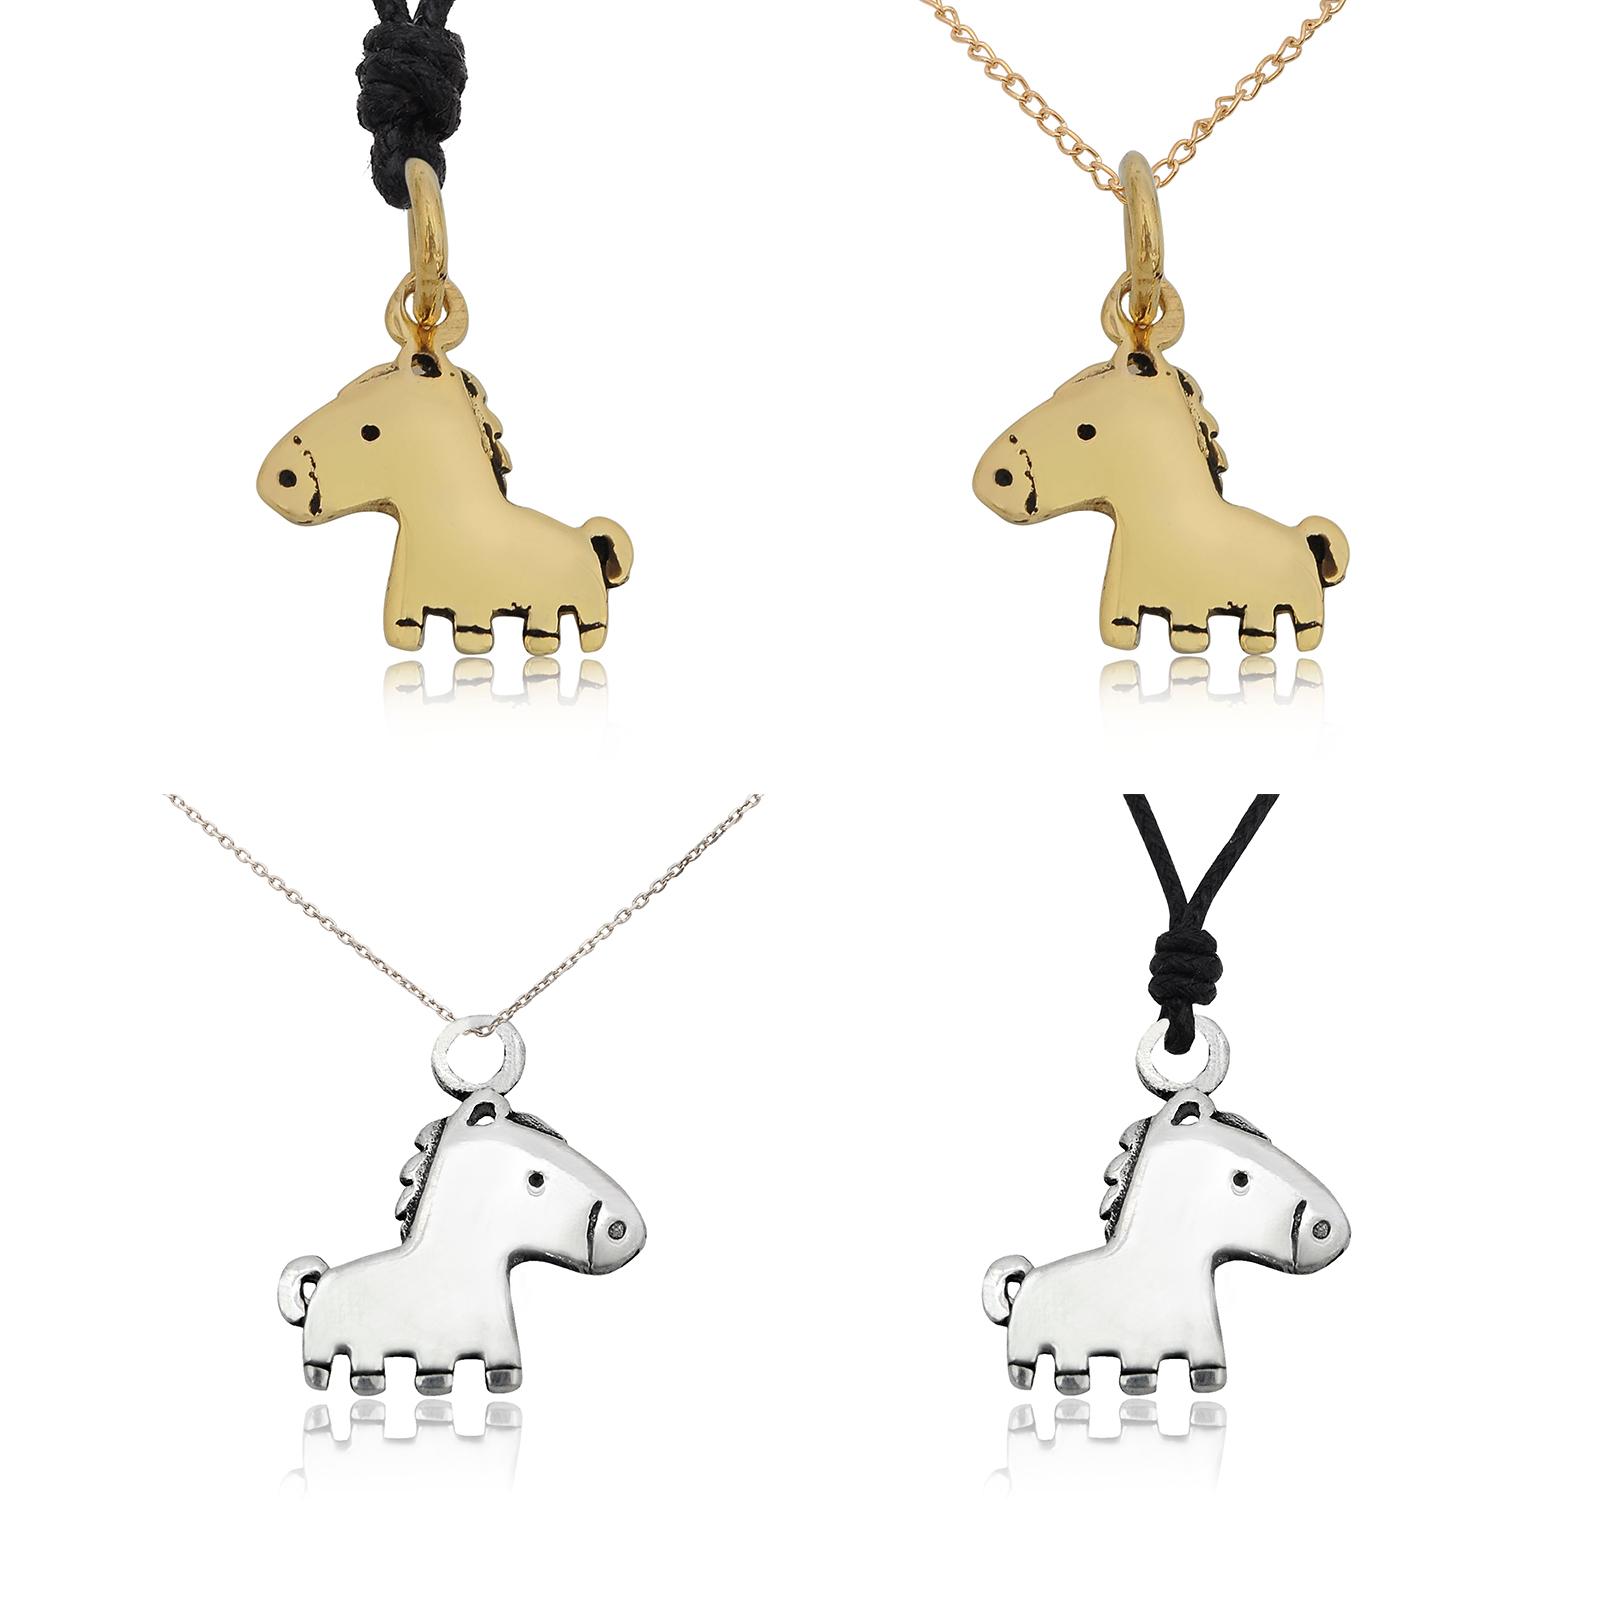 Tiny Unicorn Silver Pewter Charm  Necklace Pendant Jewelry